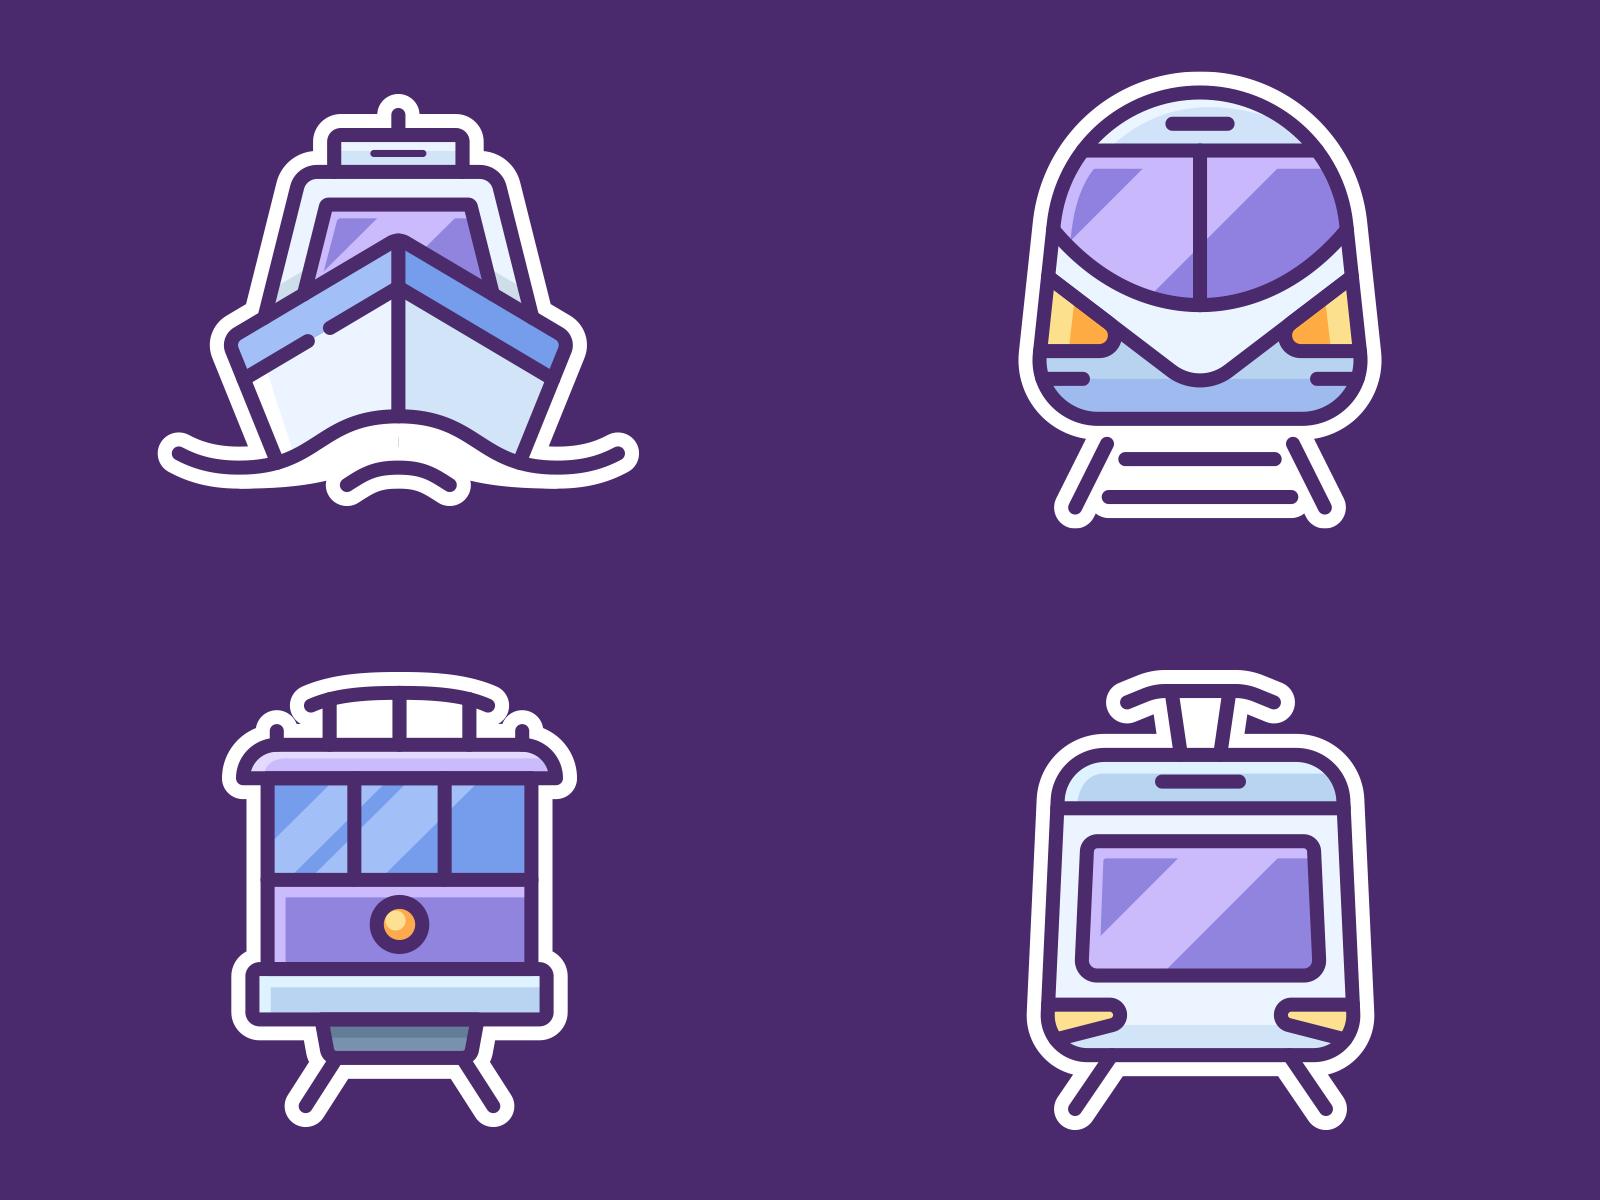 Google pigeon icons kunchevsky